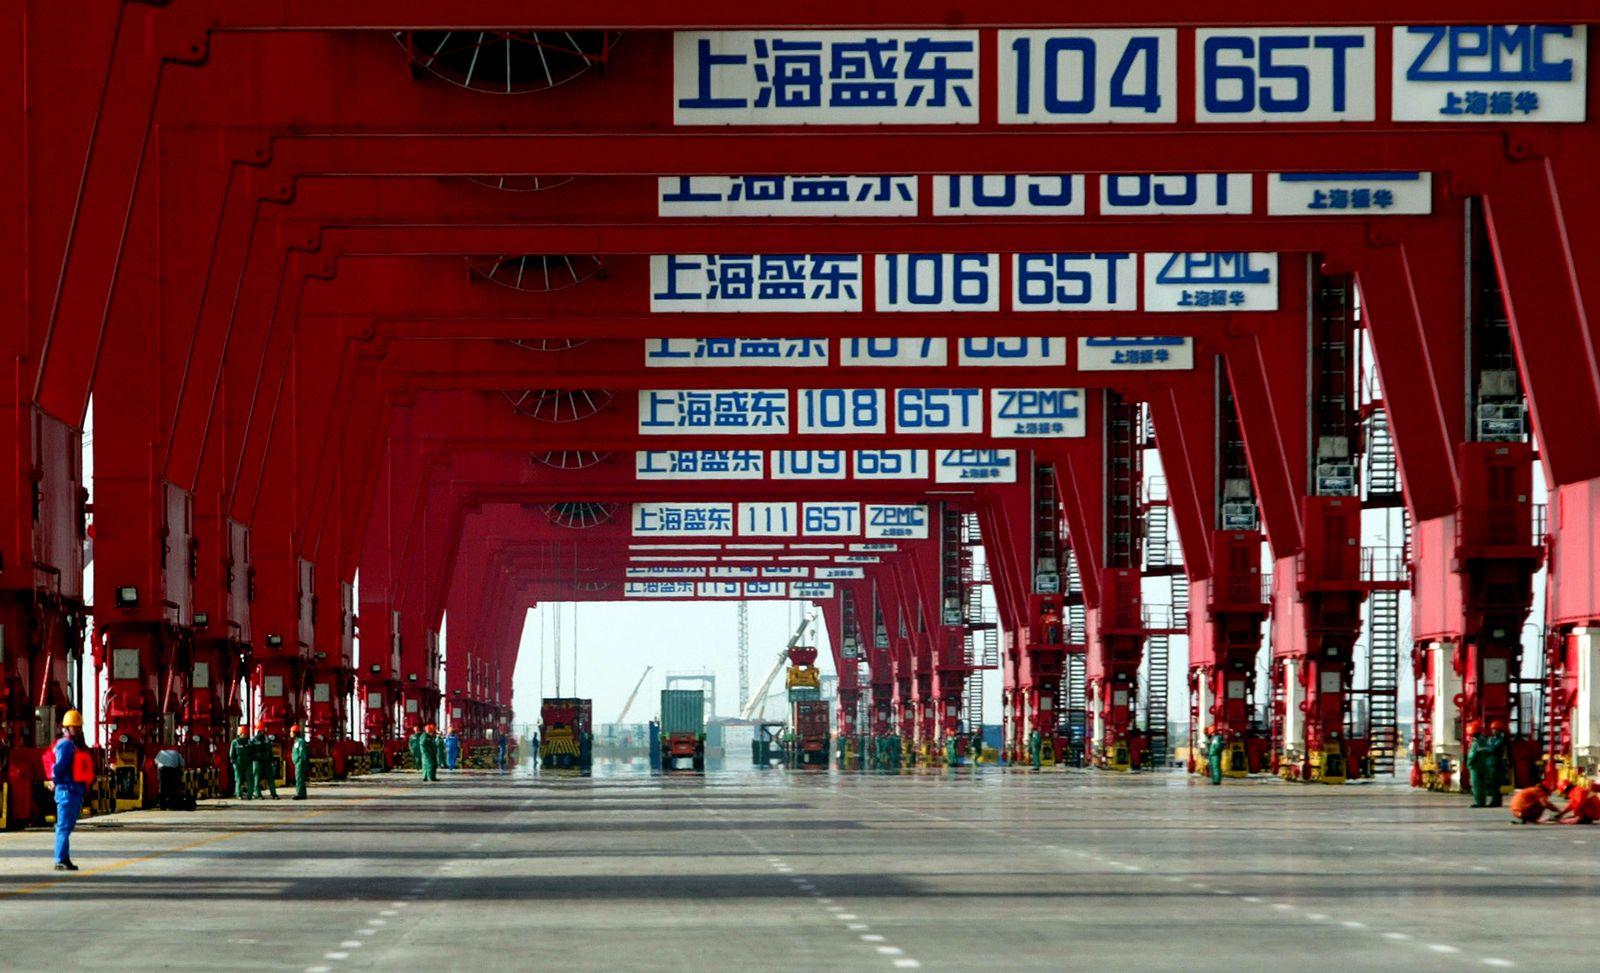 Shanghai Hafen / Yangshan container port